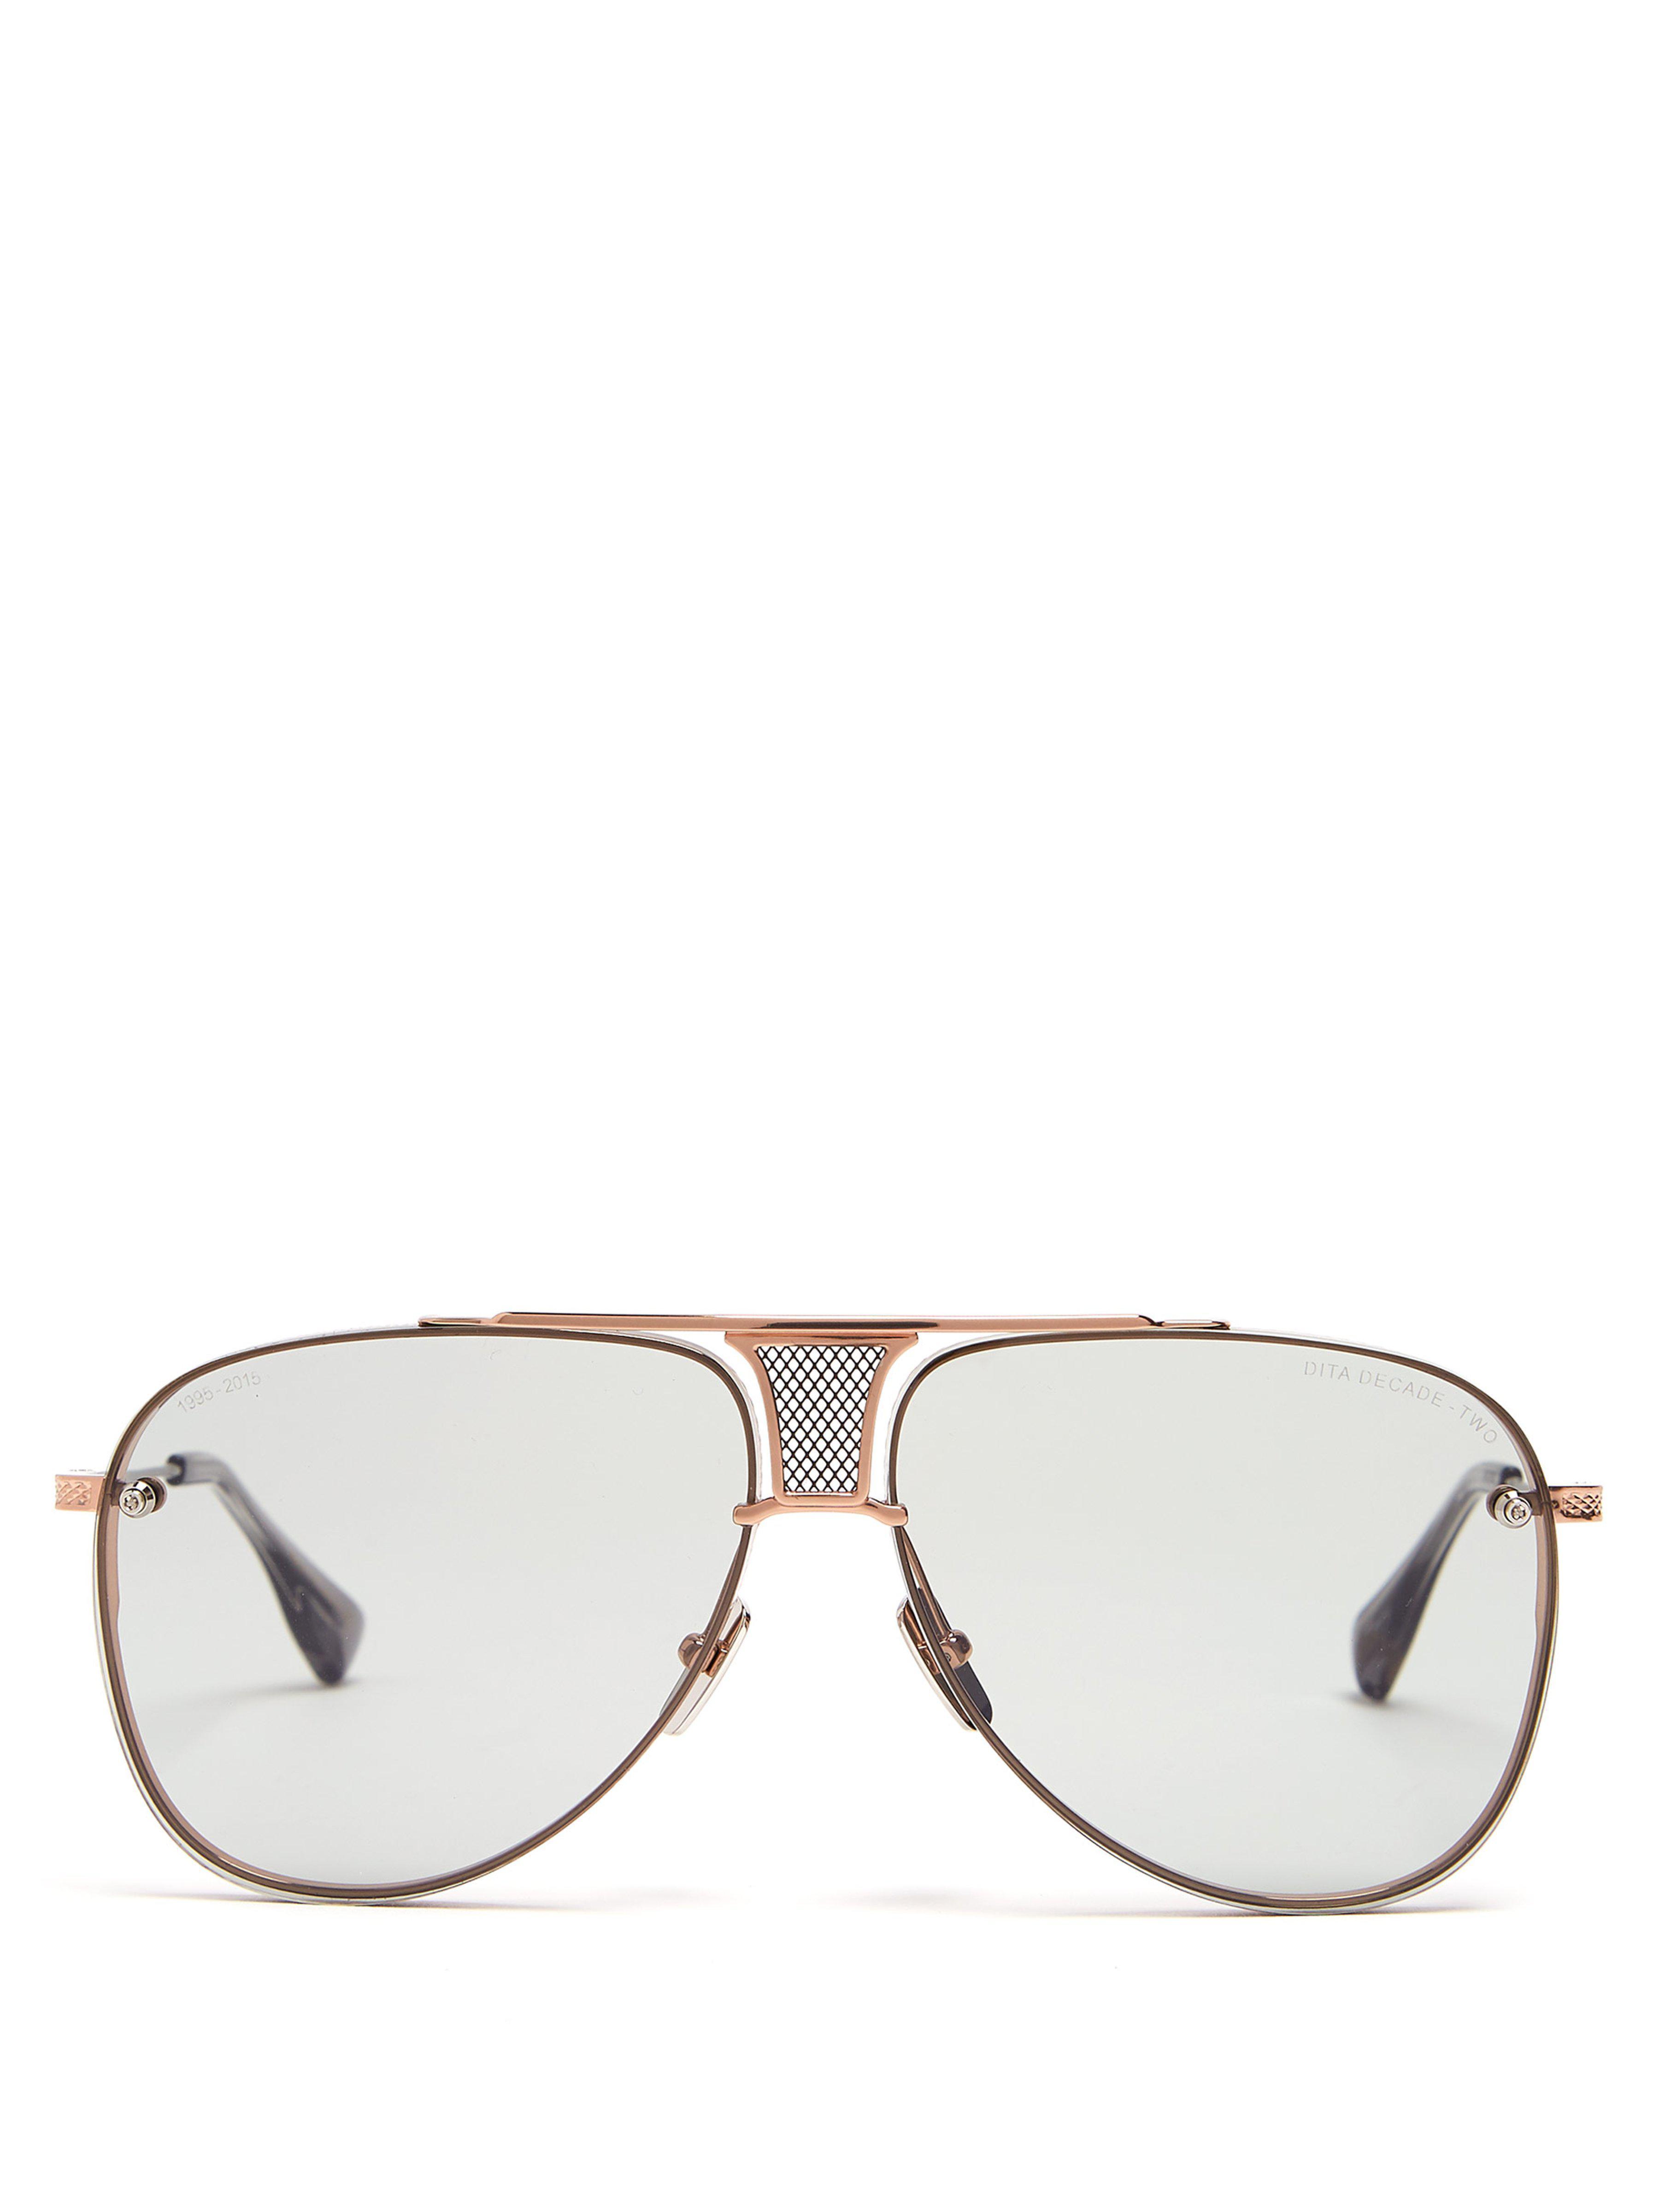 2eb4ad3cdfc2 Dita Eyewear Decade Two Aviator Sunglasses in Metallic for Men - Lyst